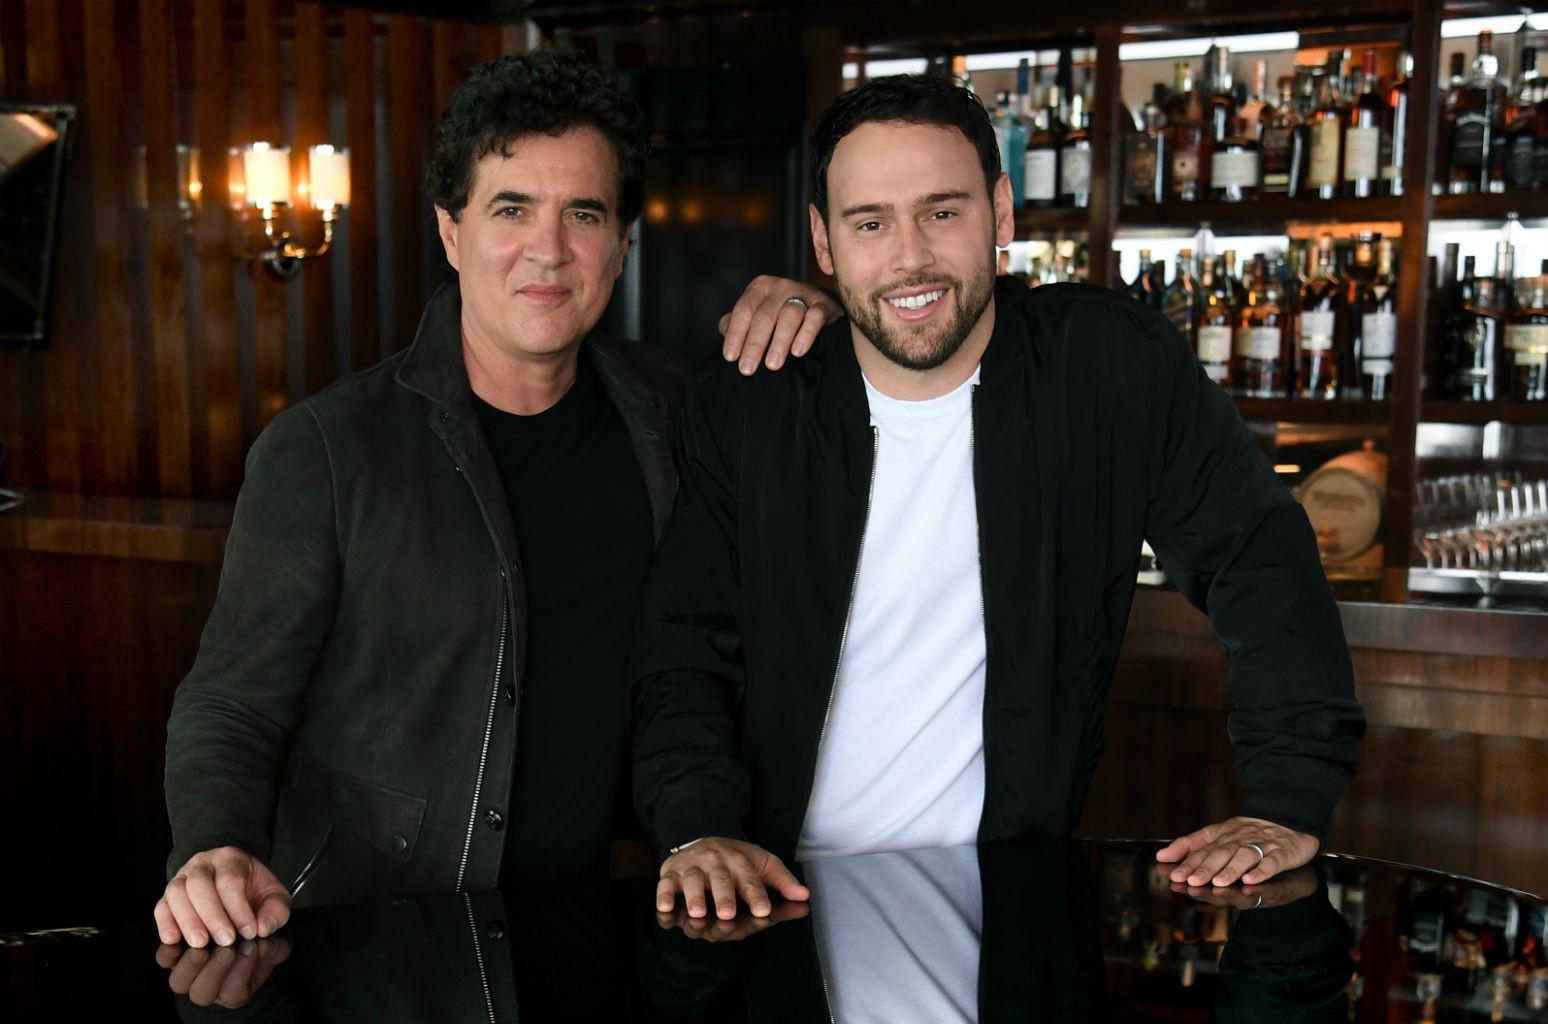 Scott Borchetta and Scooter Braun